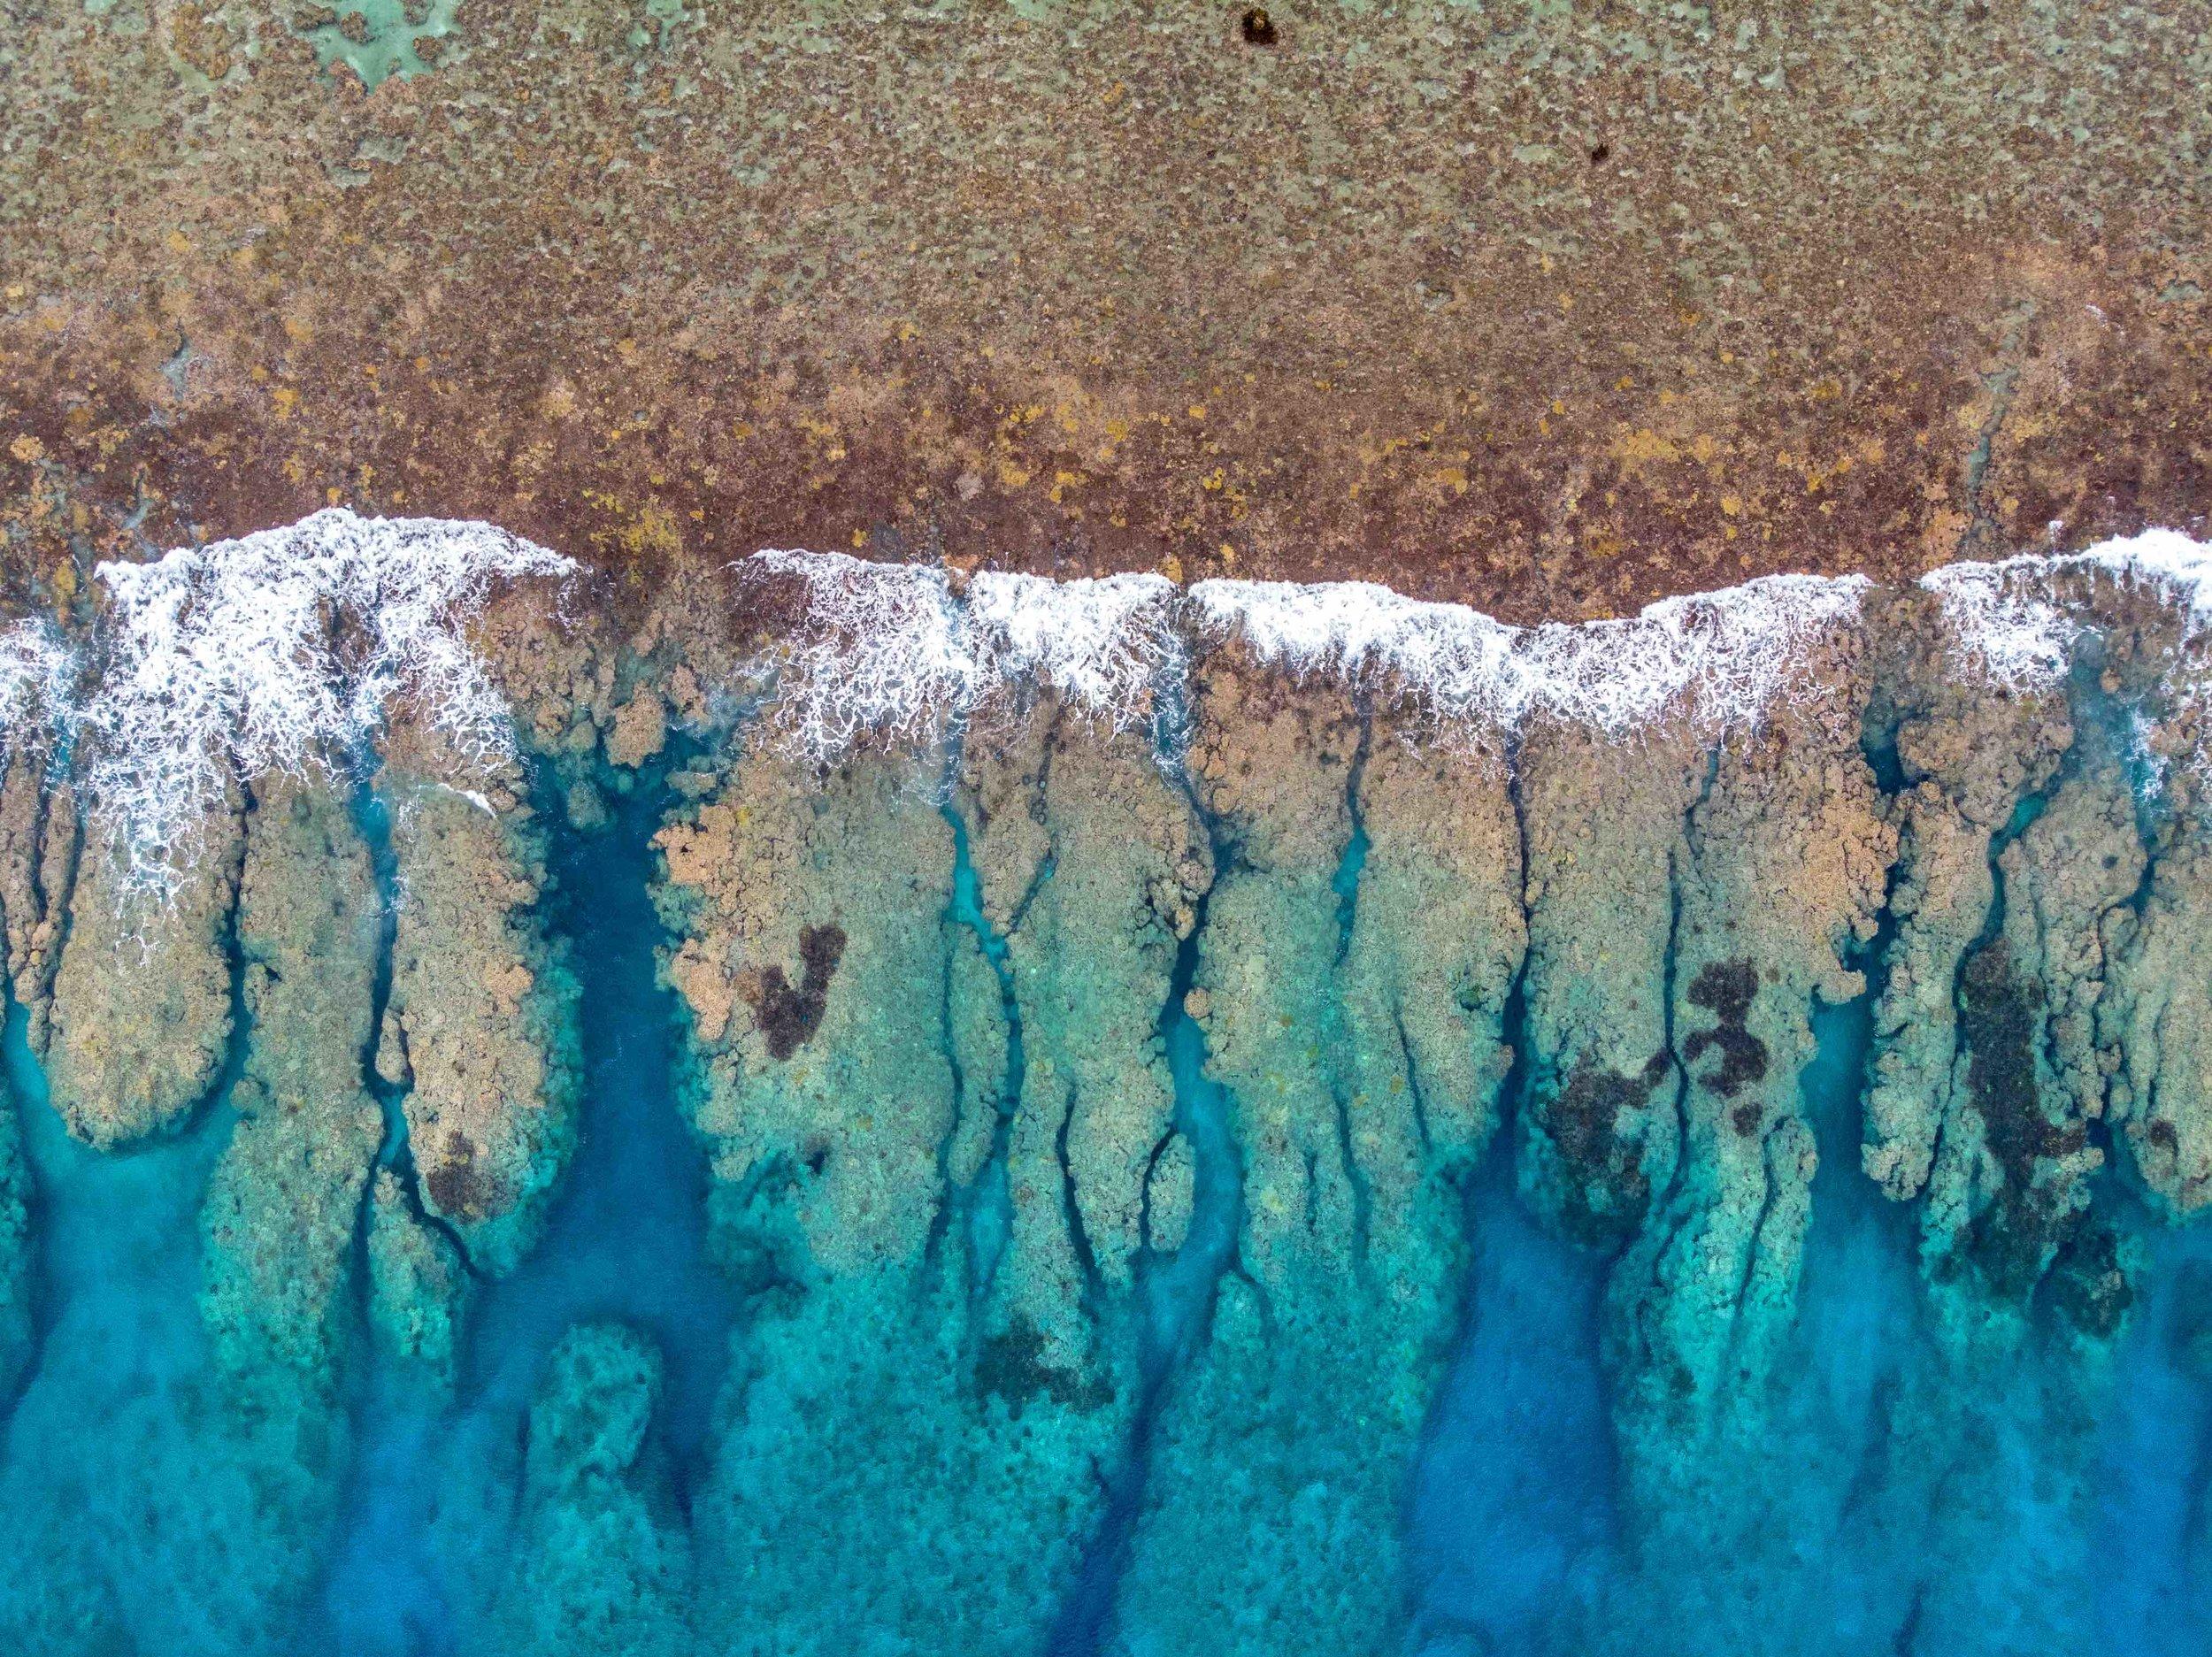 tropical_paradise_beach_island_cook islands_south pacific_reef_1.jpg